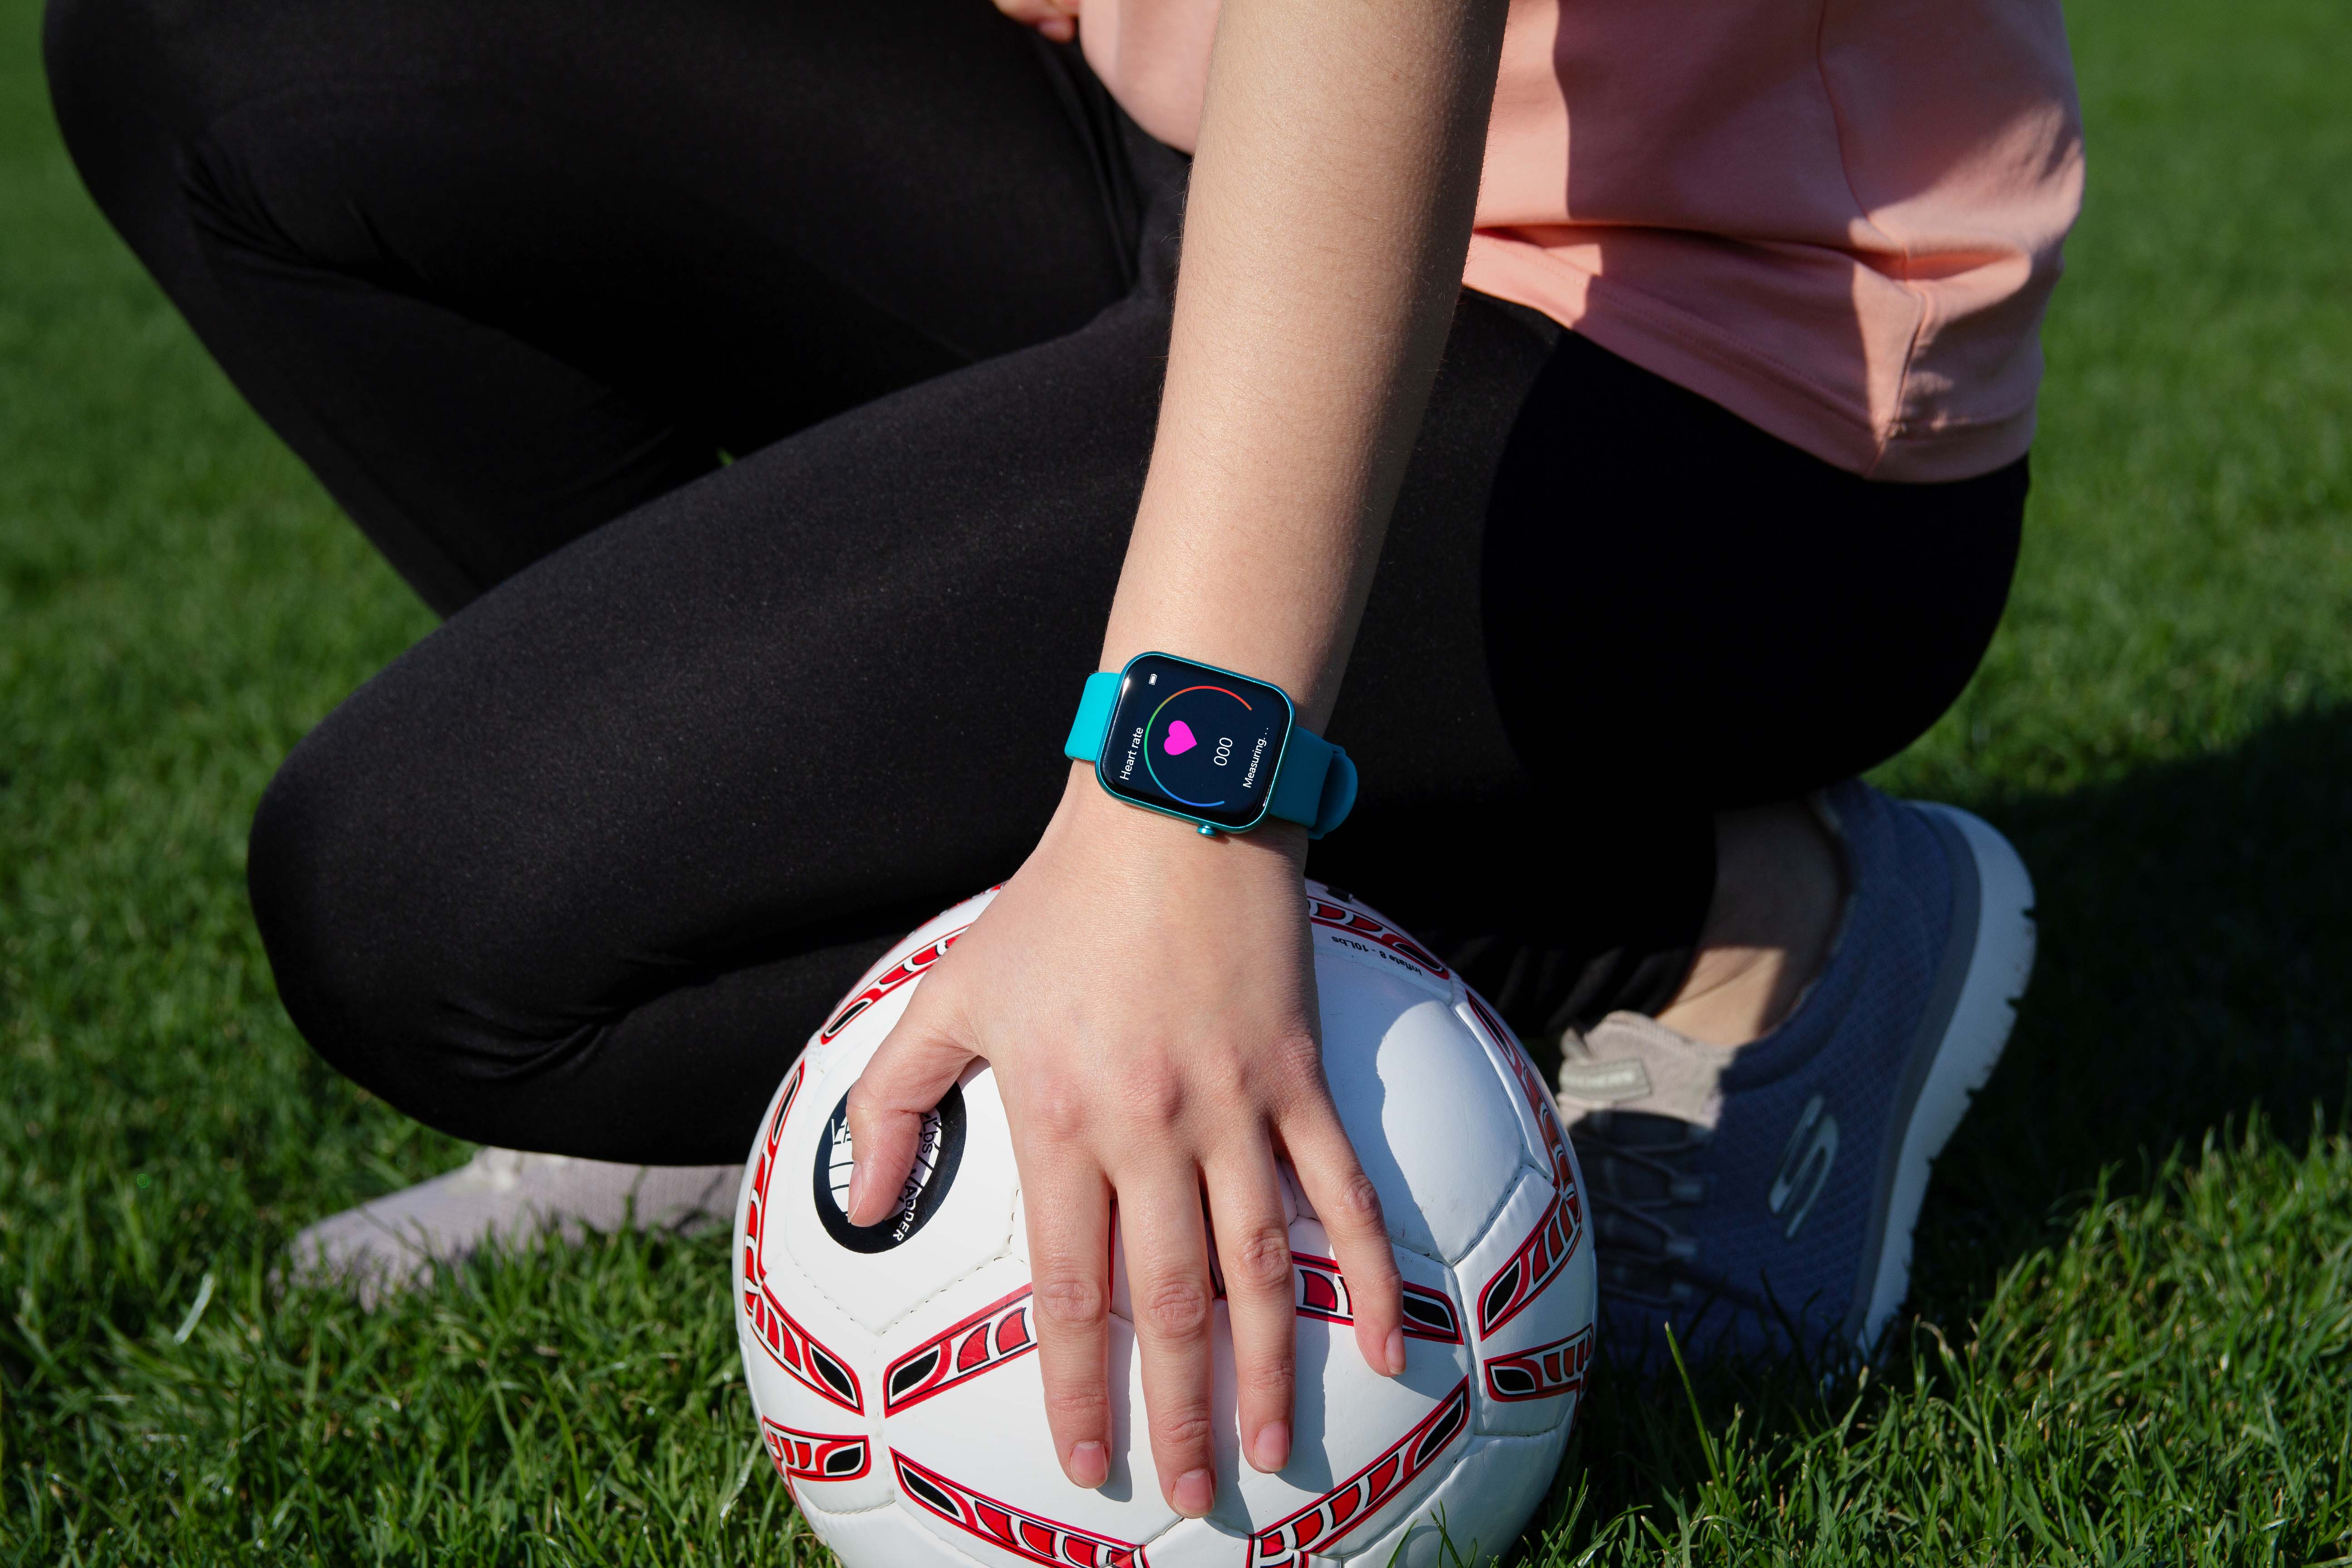 Hc98be175c34548daaca16217556e3429V MISIRUN Z15 Smart Watch for Man Women Full Touch Blood Pressure Smart Clock Women watch Smartwatch for IOS Android Xiaomi Phone